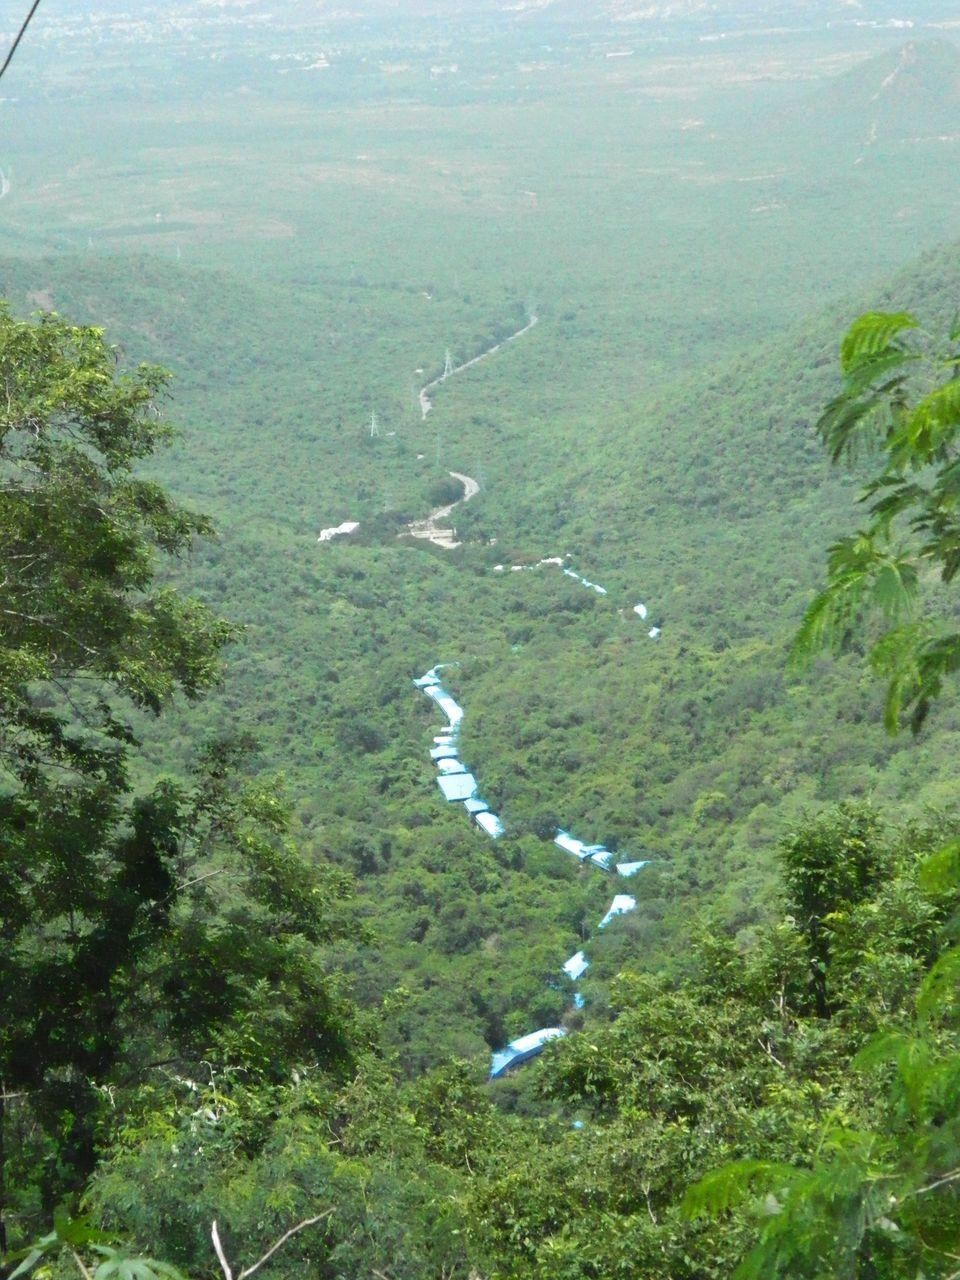 Photos of Breathtaking view of Srivari Mettu from Tirumala 1/1 by Bhargav KVRK